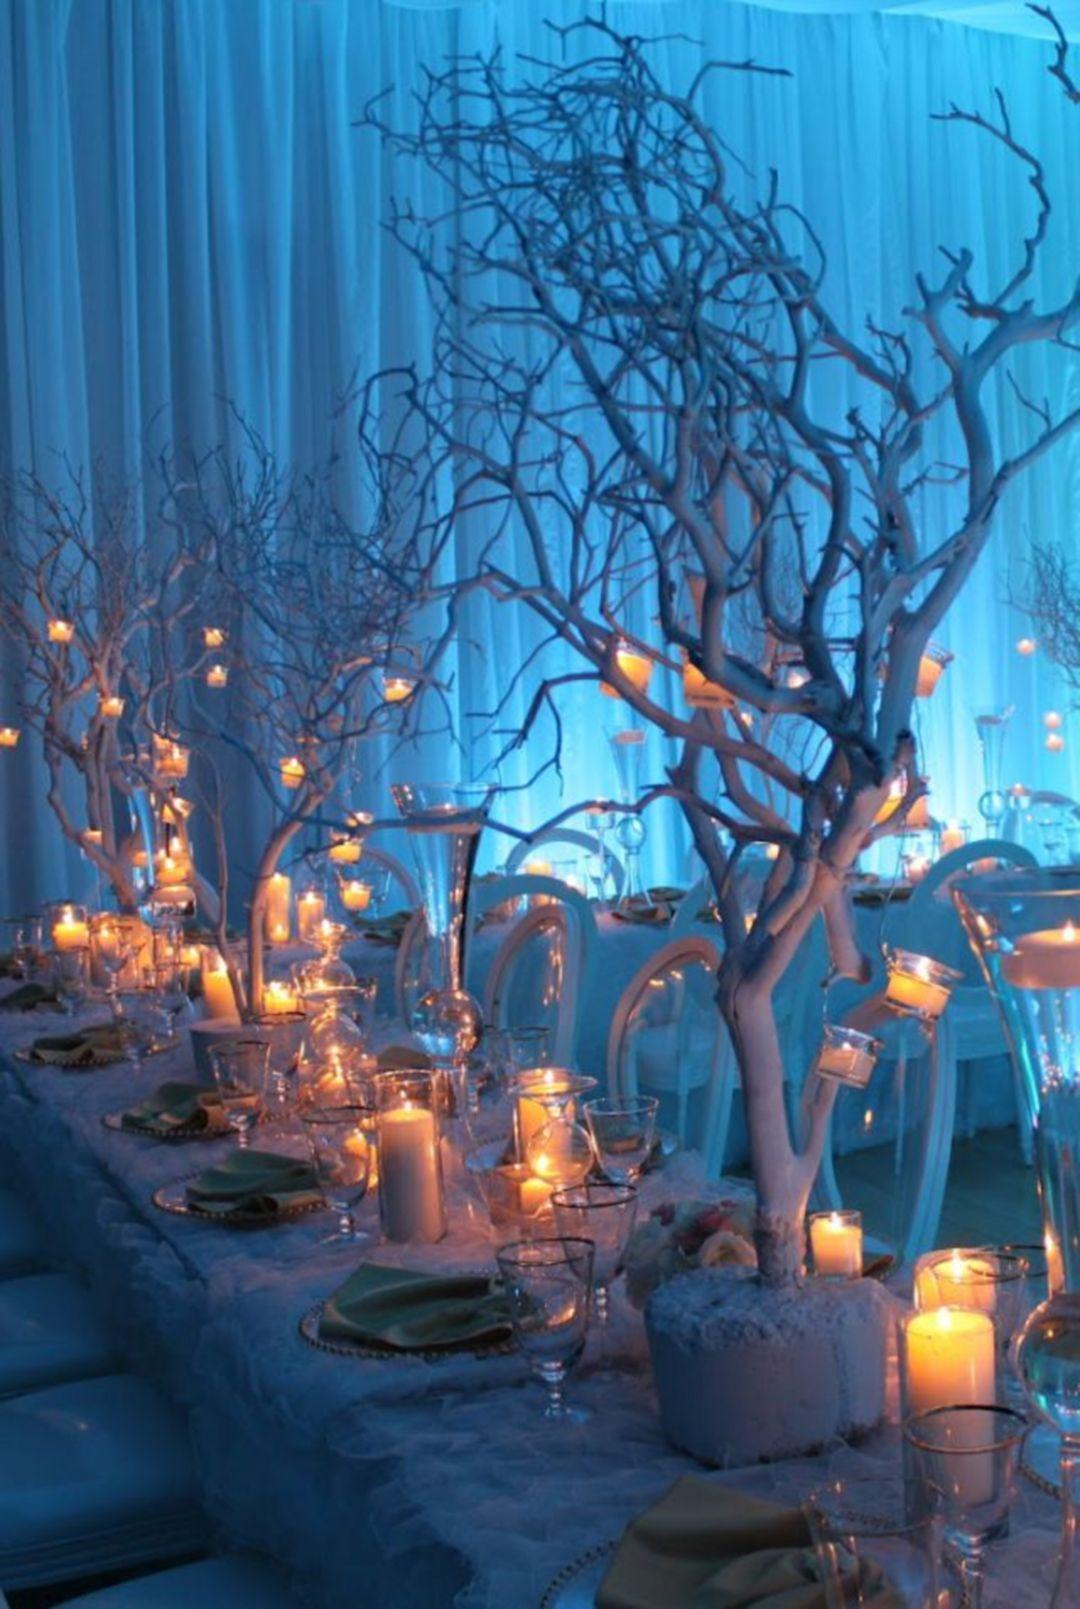 Pin By Johanna Kumala On Feelis Wonderland Wedding Theme Winter Wonderland Wedding Theme Winter Wonderland Theme